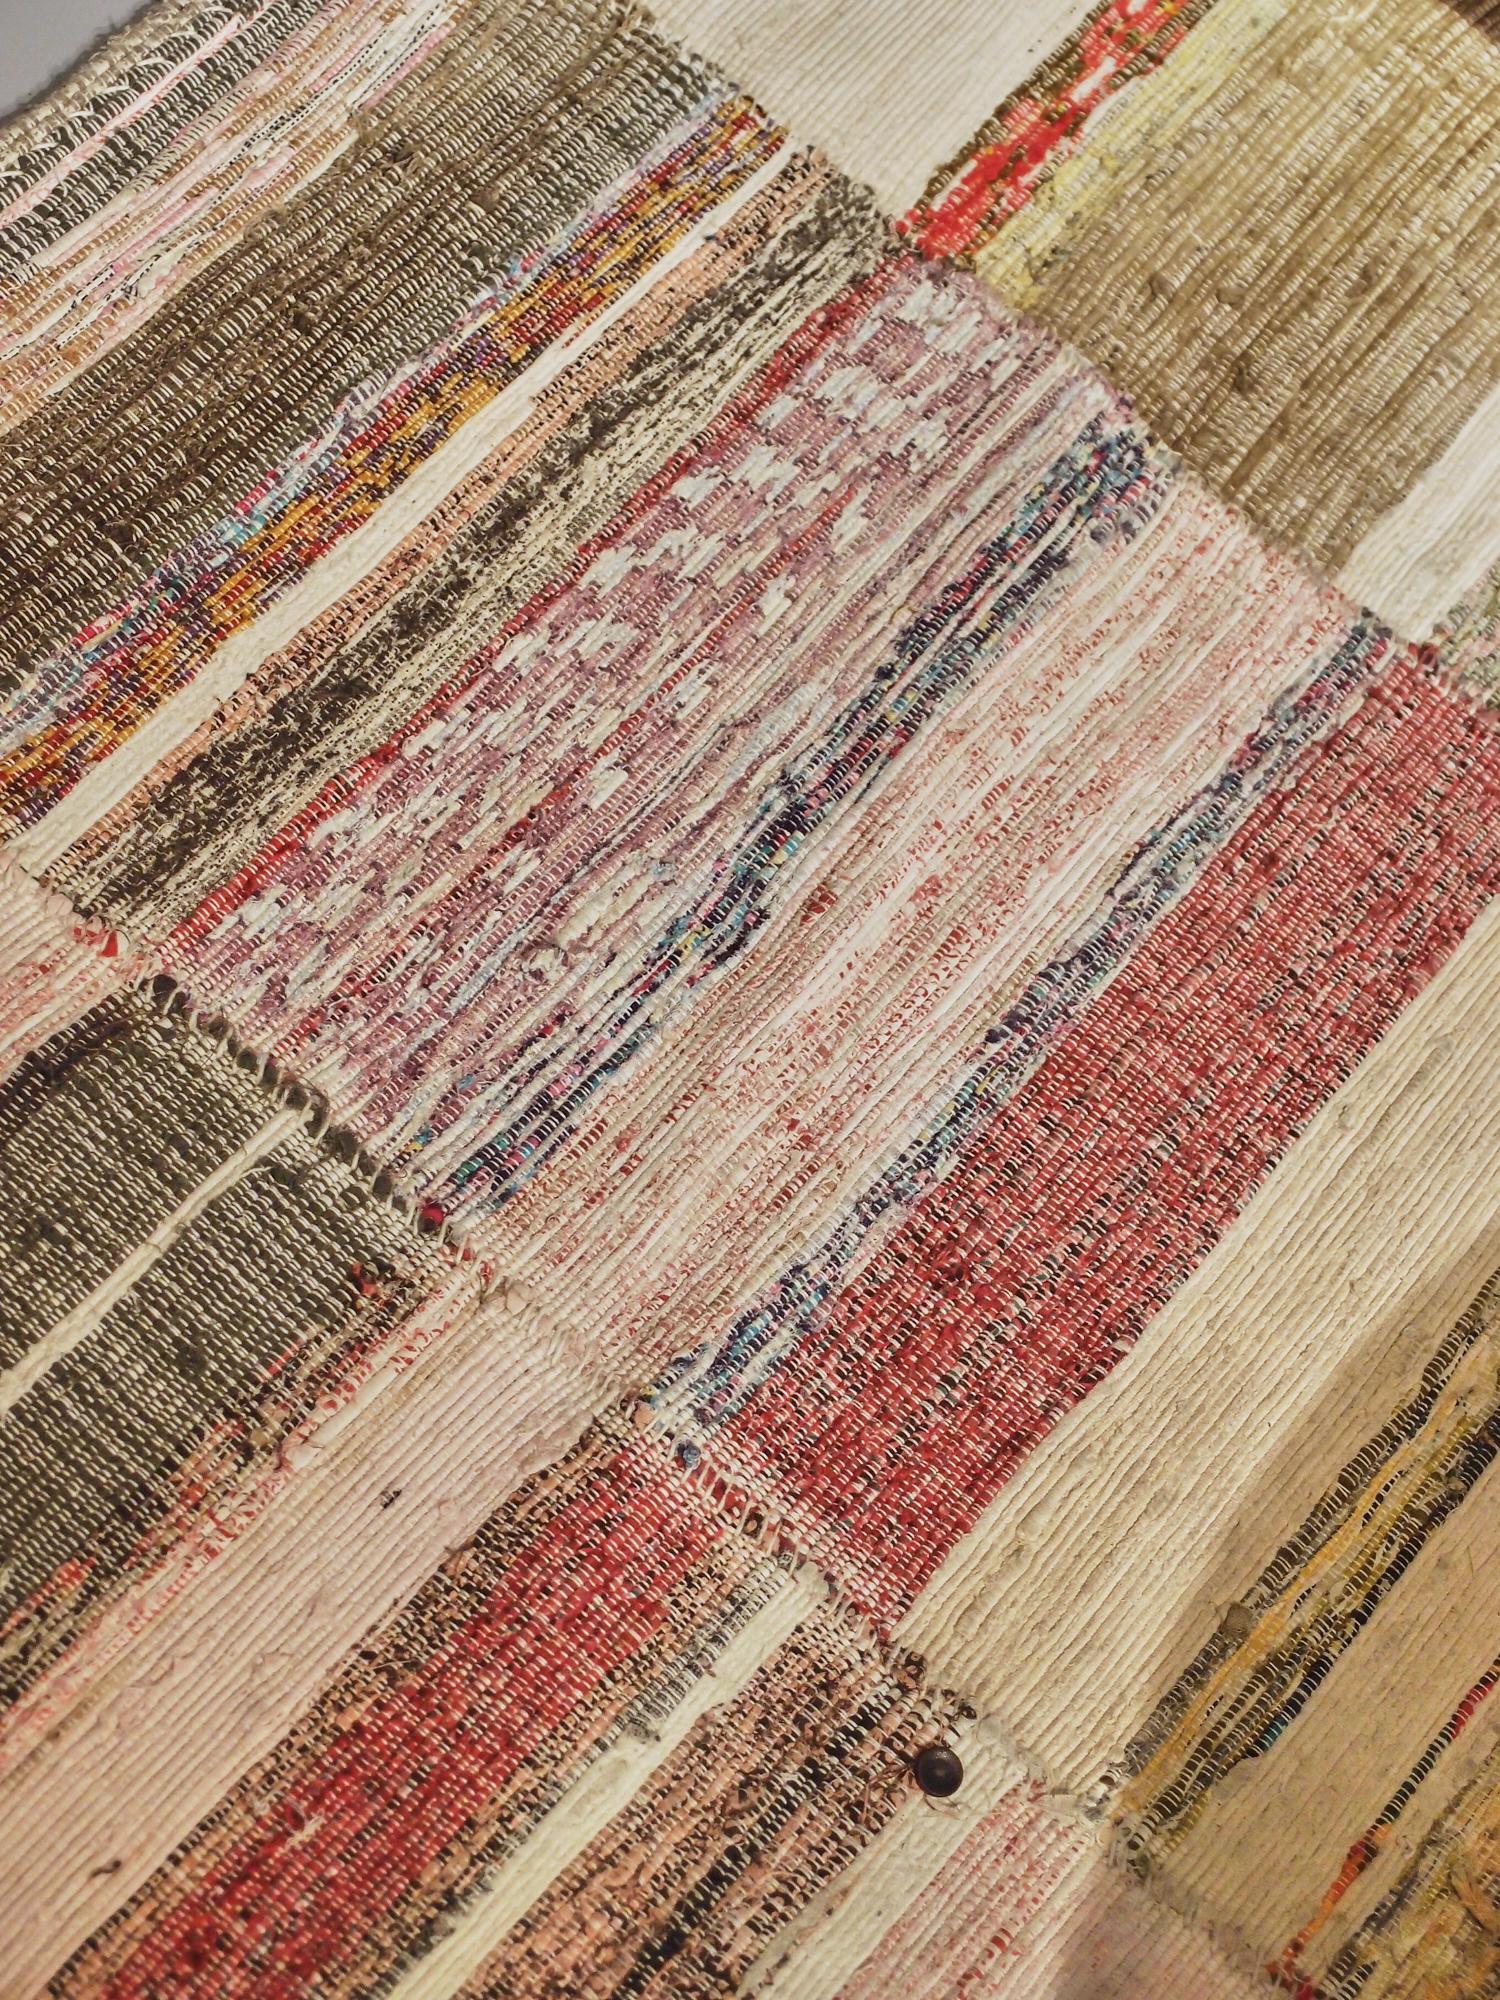 bespoke swedish rug 0_2.jpg